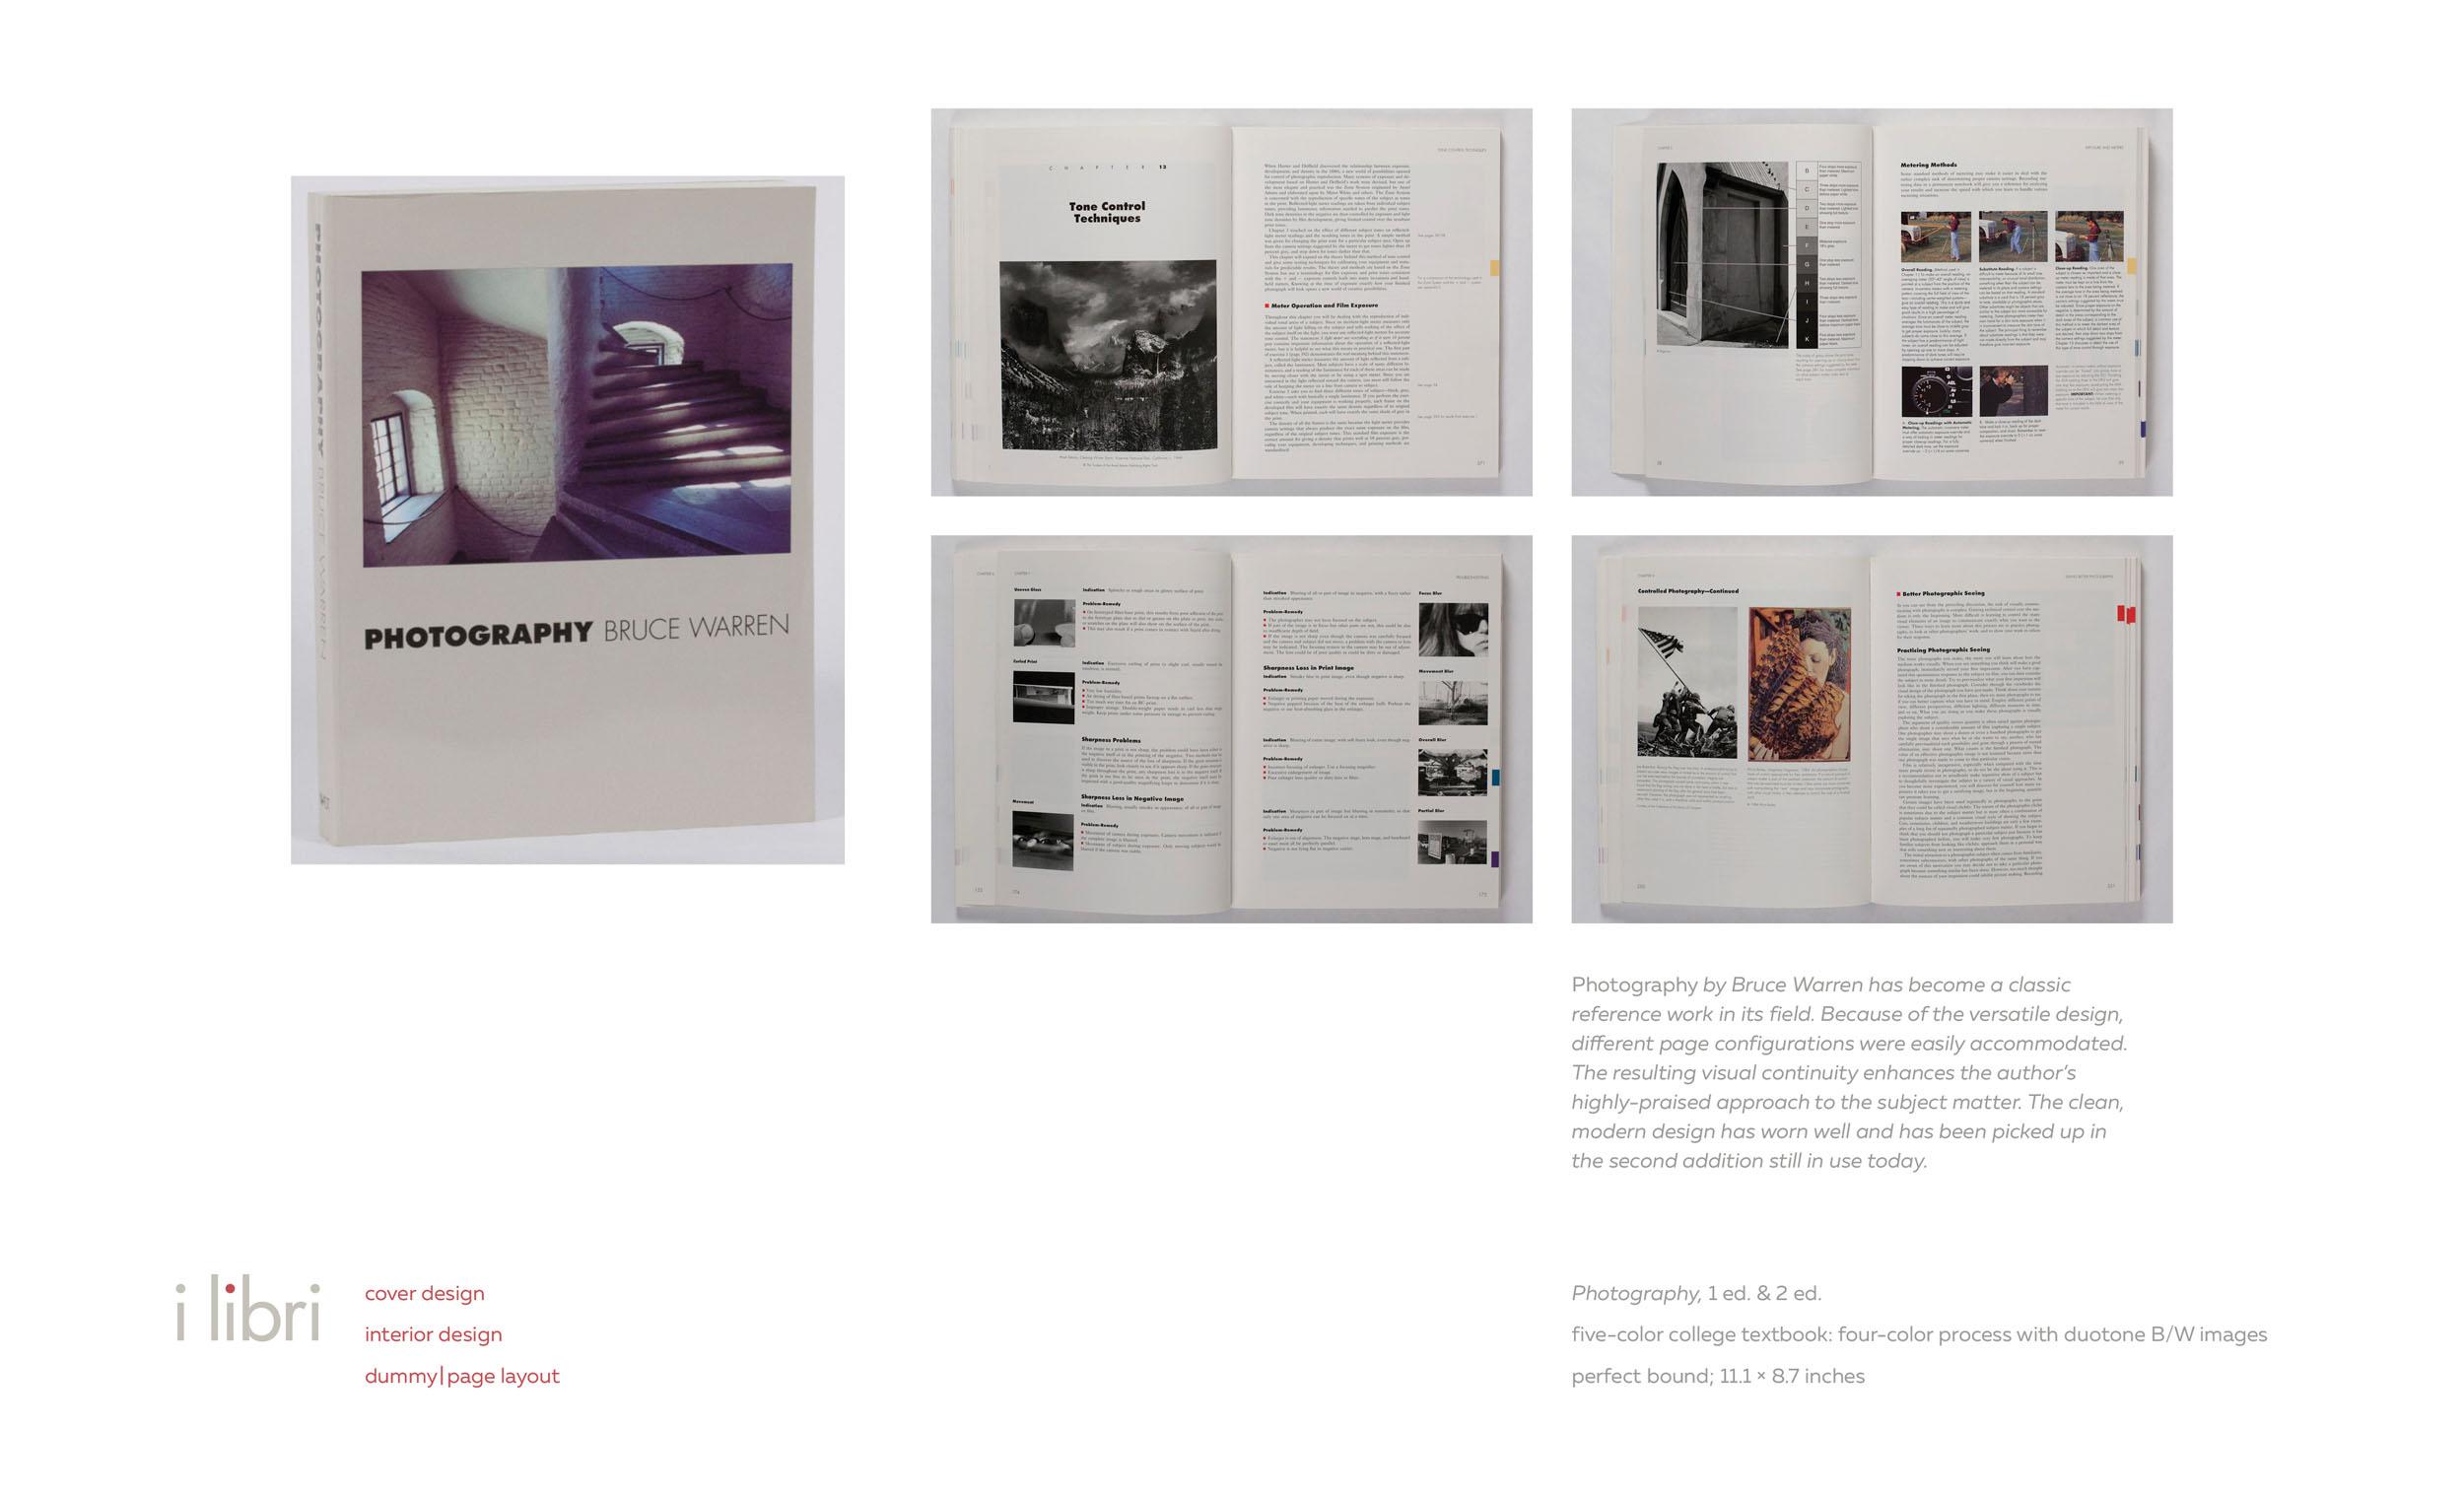 Photography 1E & 2E  by Bruce Warren | cover design (1E), interior book design (1E & 2E), book dummy (1E)